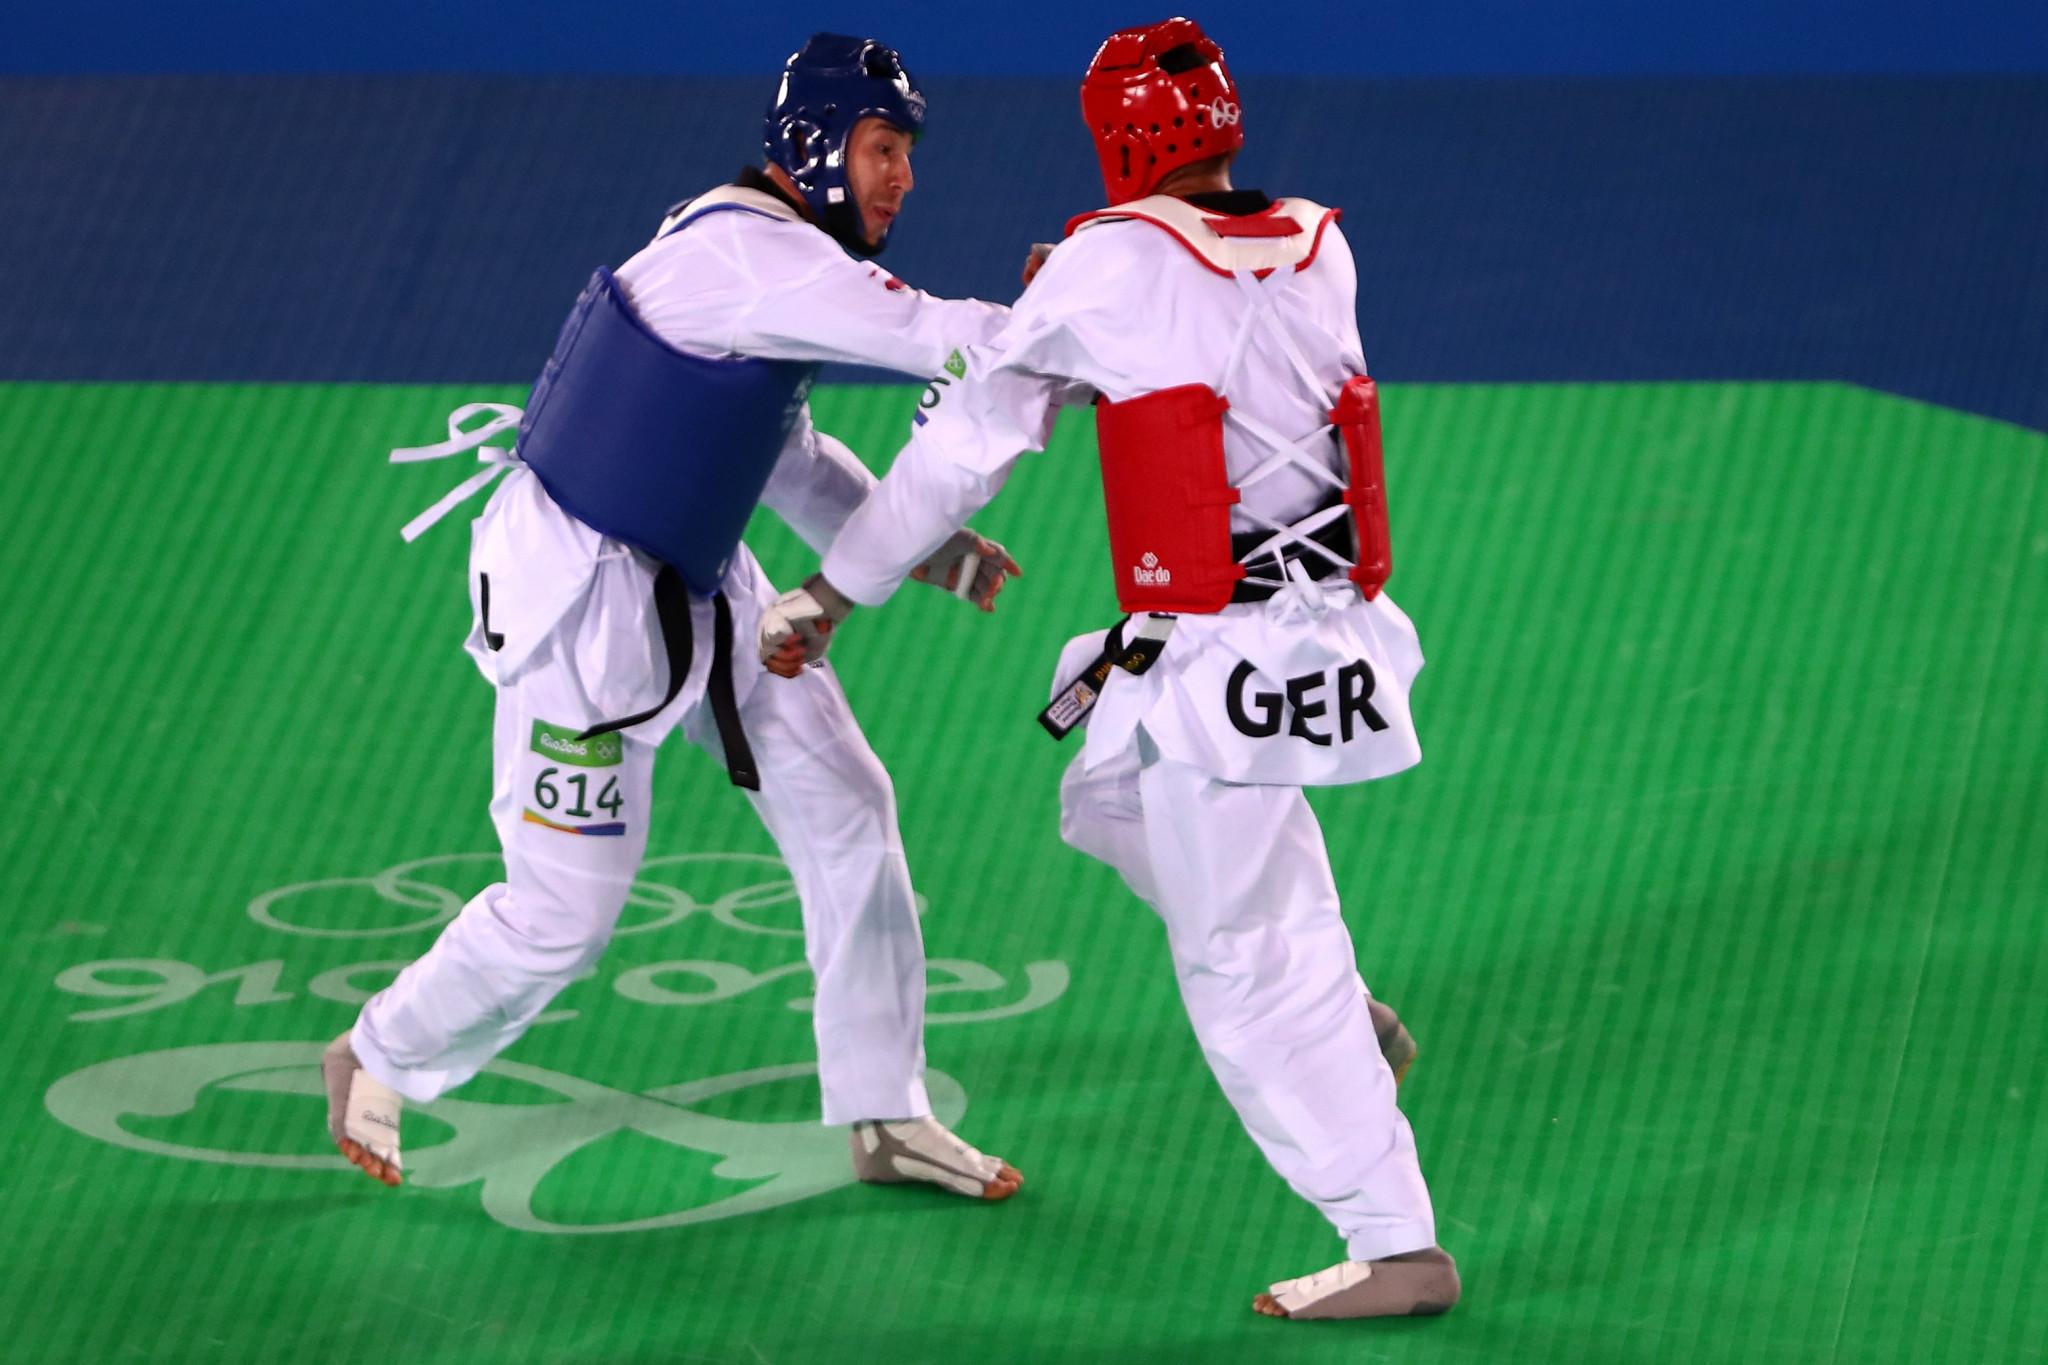 Stefan Klawiter is President of the German Taekwondo Union ©Getty Images